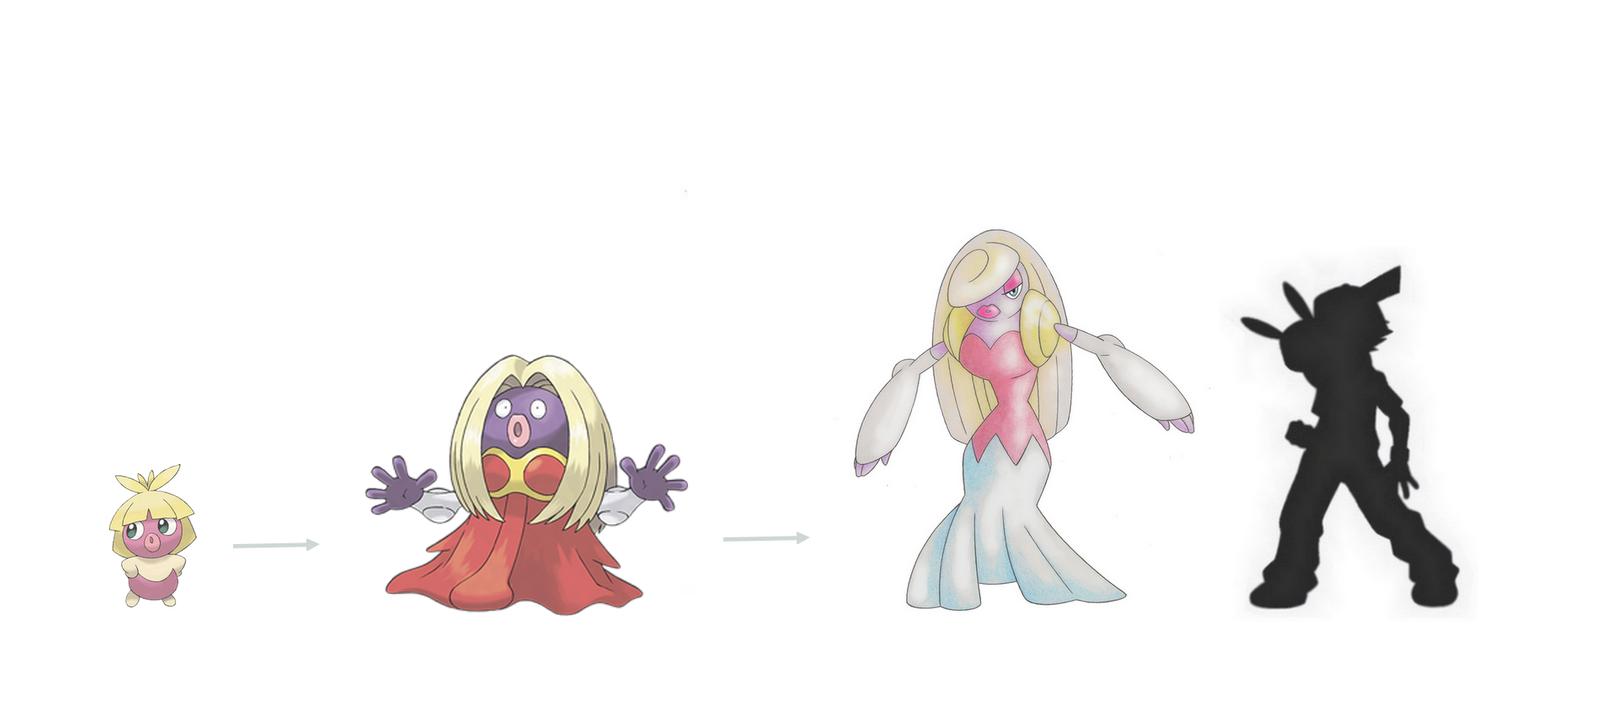 Pokemon Jynx Evolution Images | Pokemon Images